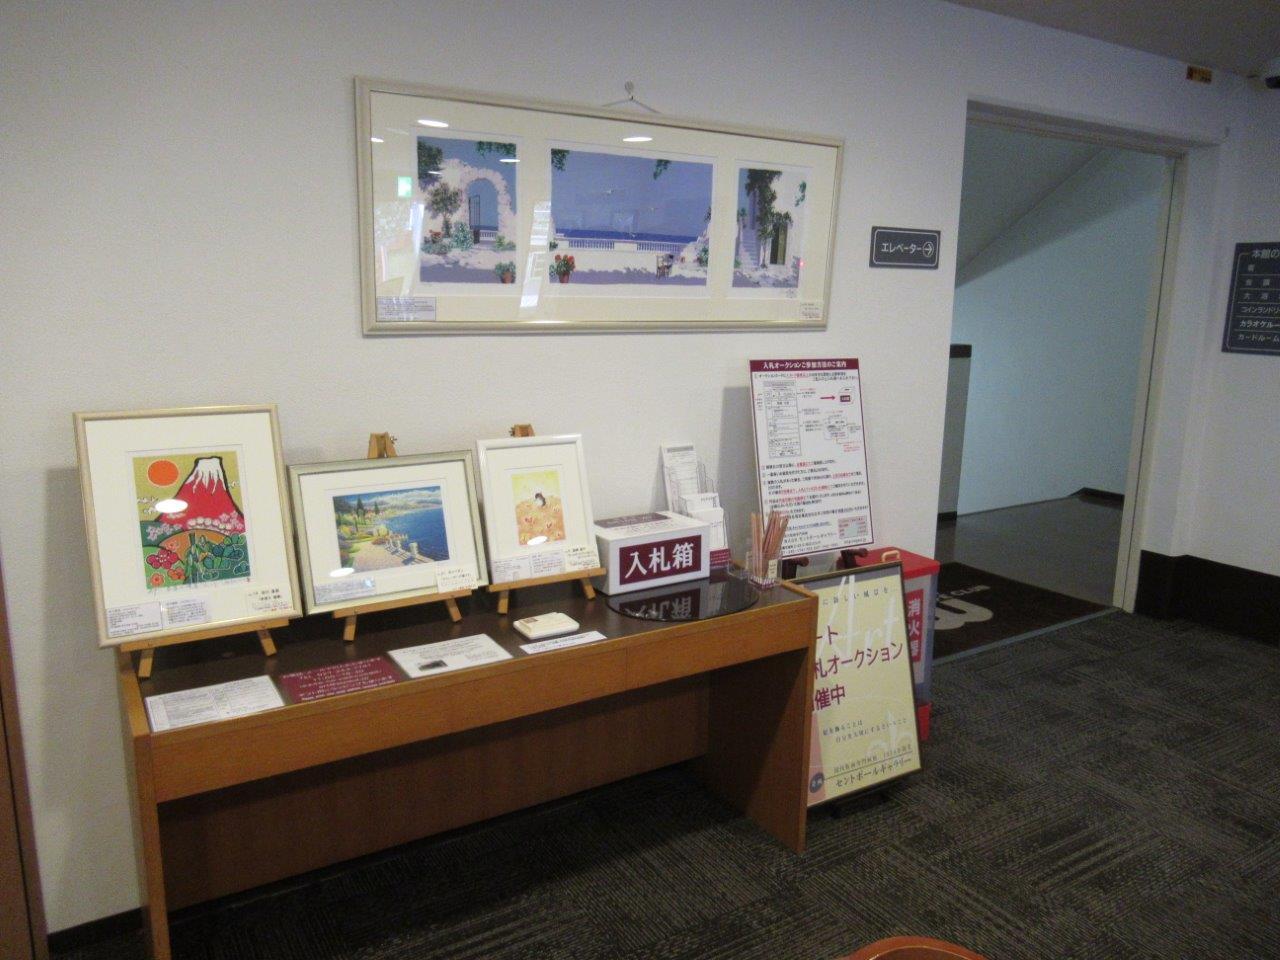 WLC宇佐美Ⅰロビーに現代版画専門のアートギャラリーを開催